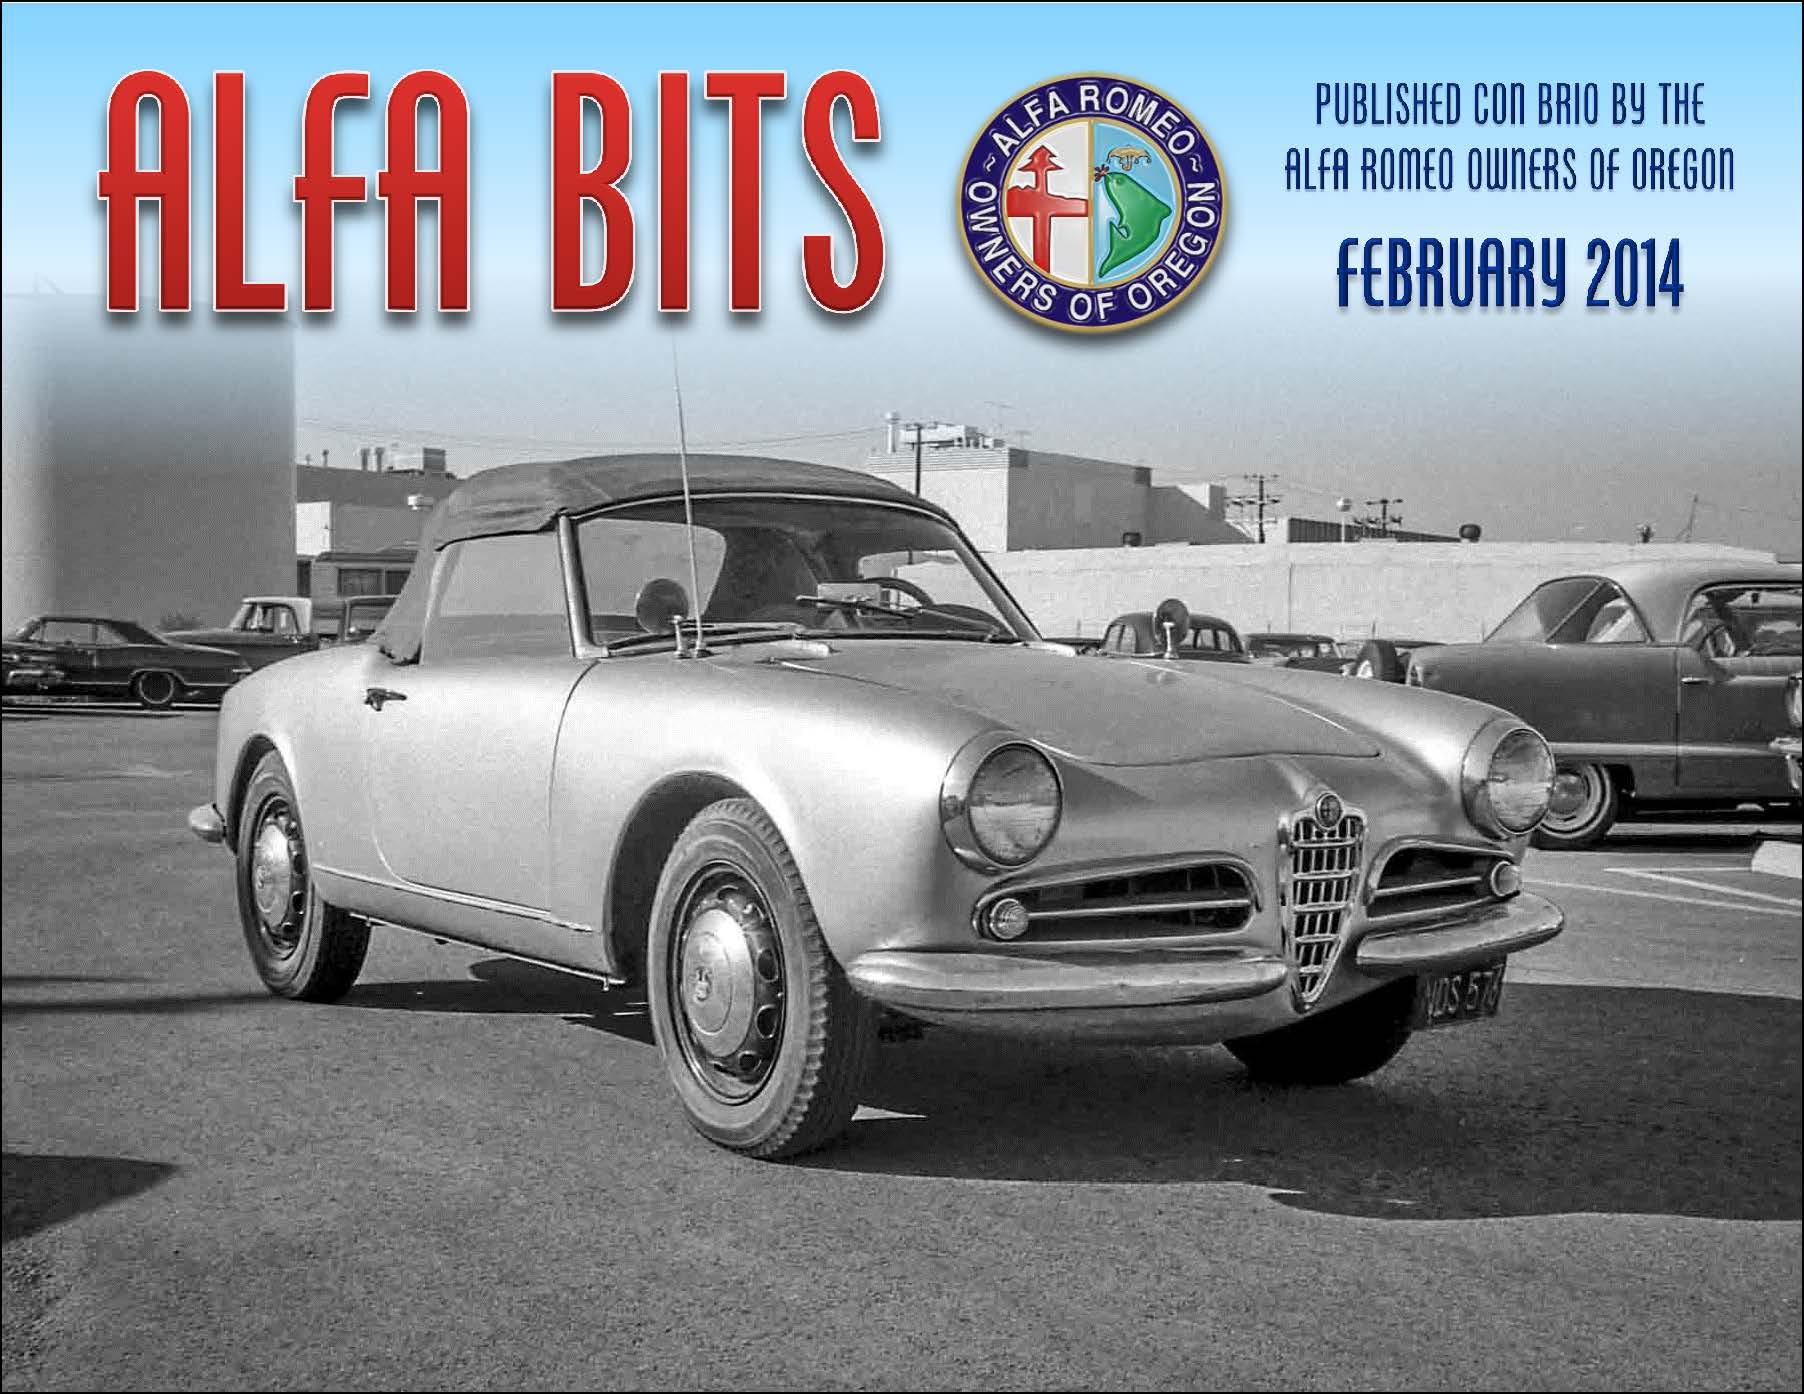 www.alfaclub.org_Newsletters_files_ALFA BITS 2014 02_Page_01